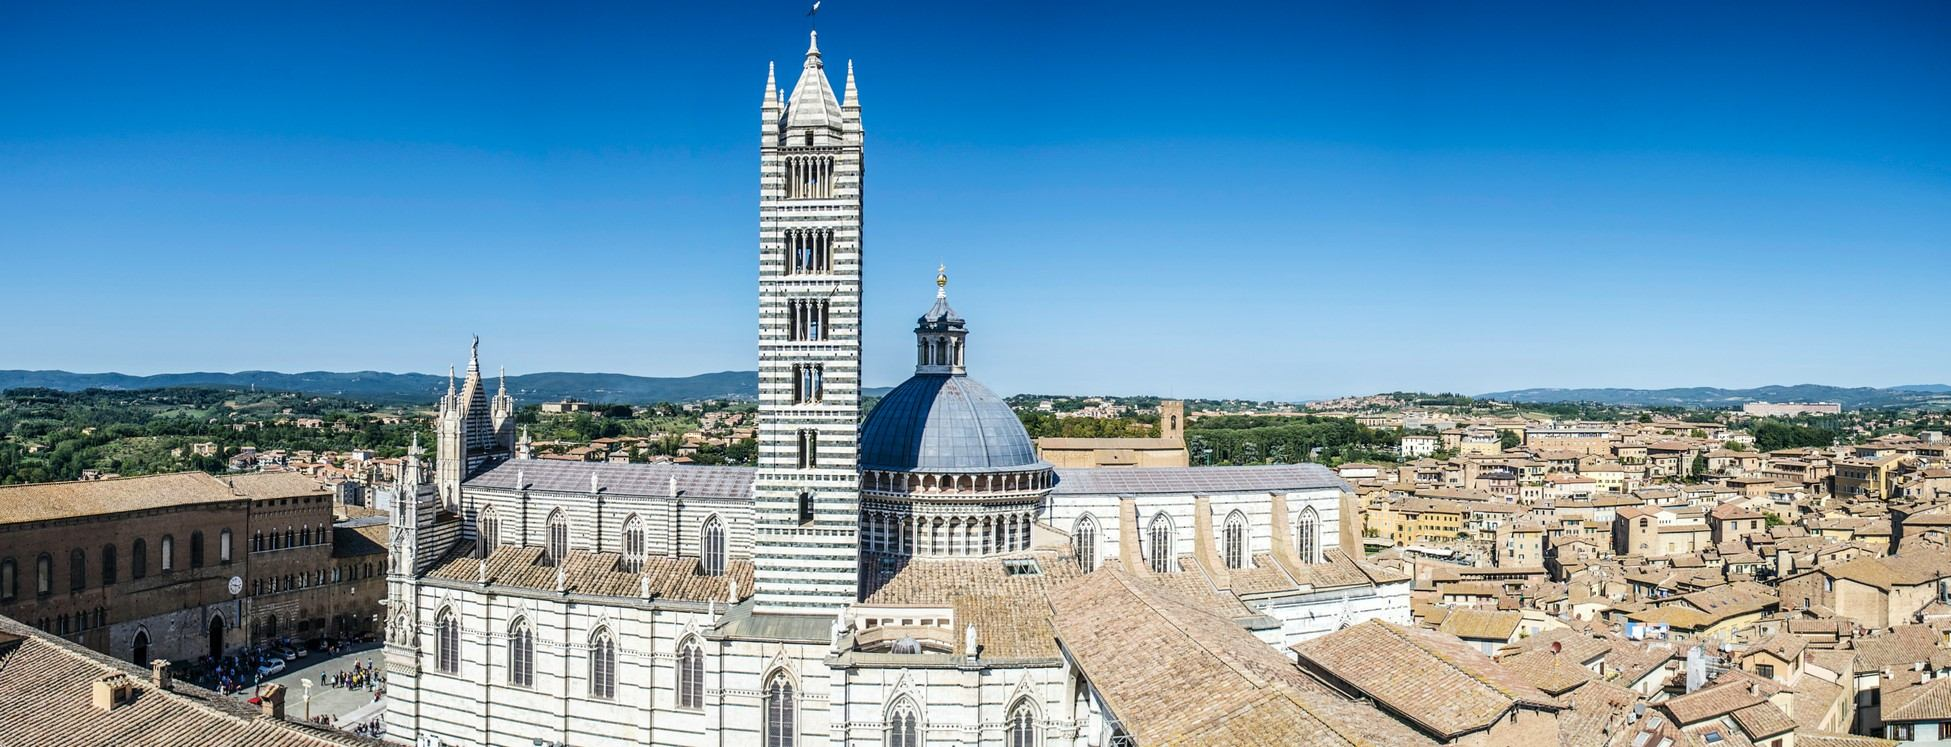 4 Siena Italië 130 x 50 cm ( 312€)